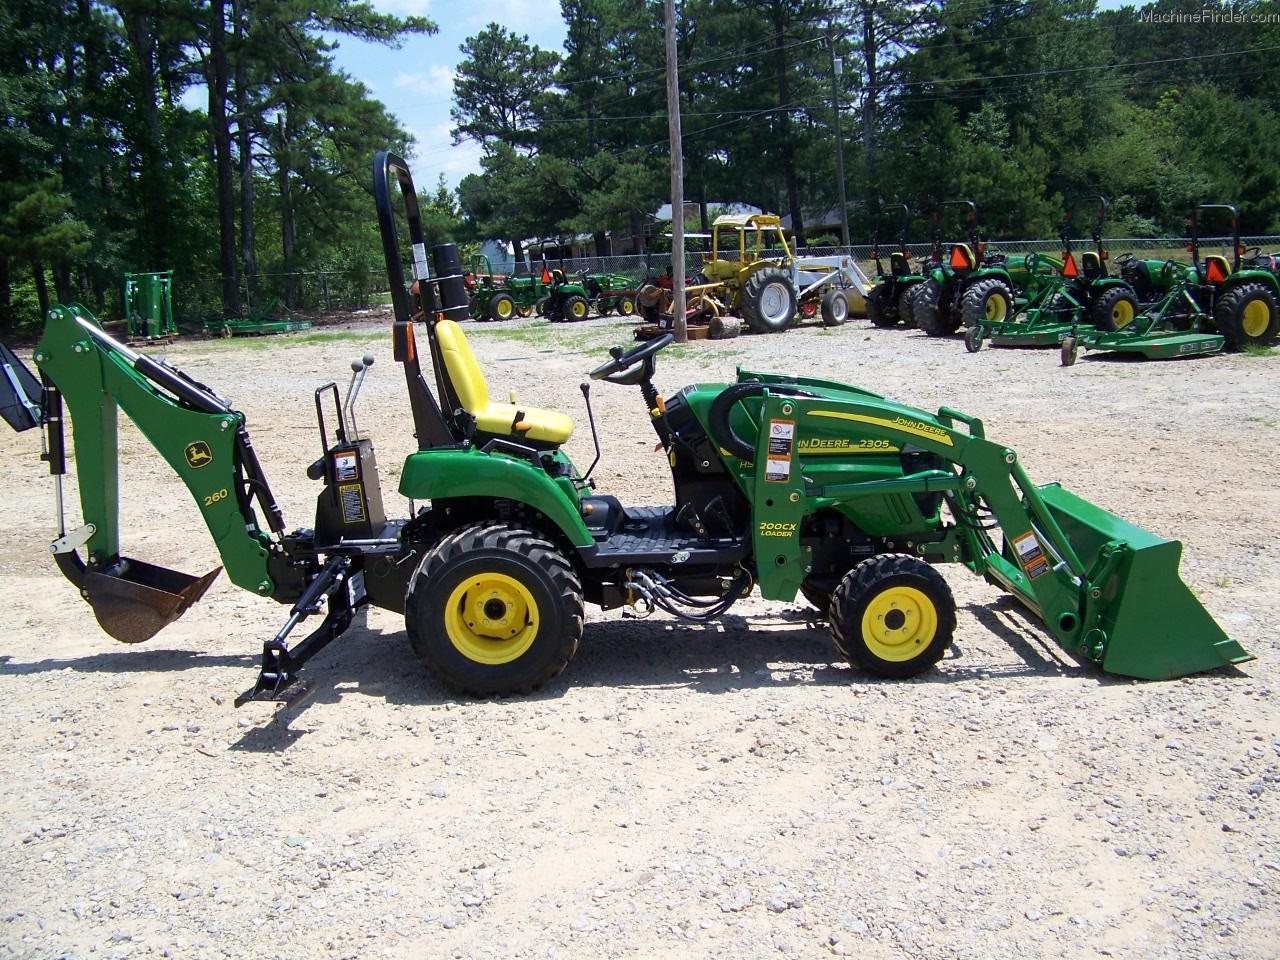 2010 John Deere 2305 Tractors - Compact (1-40hp.) - John ...